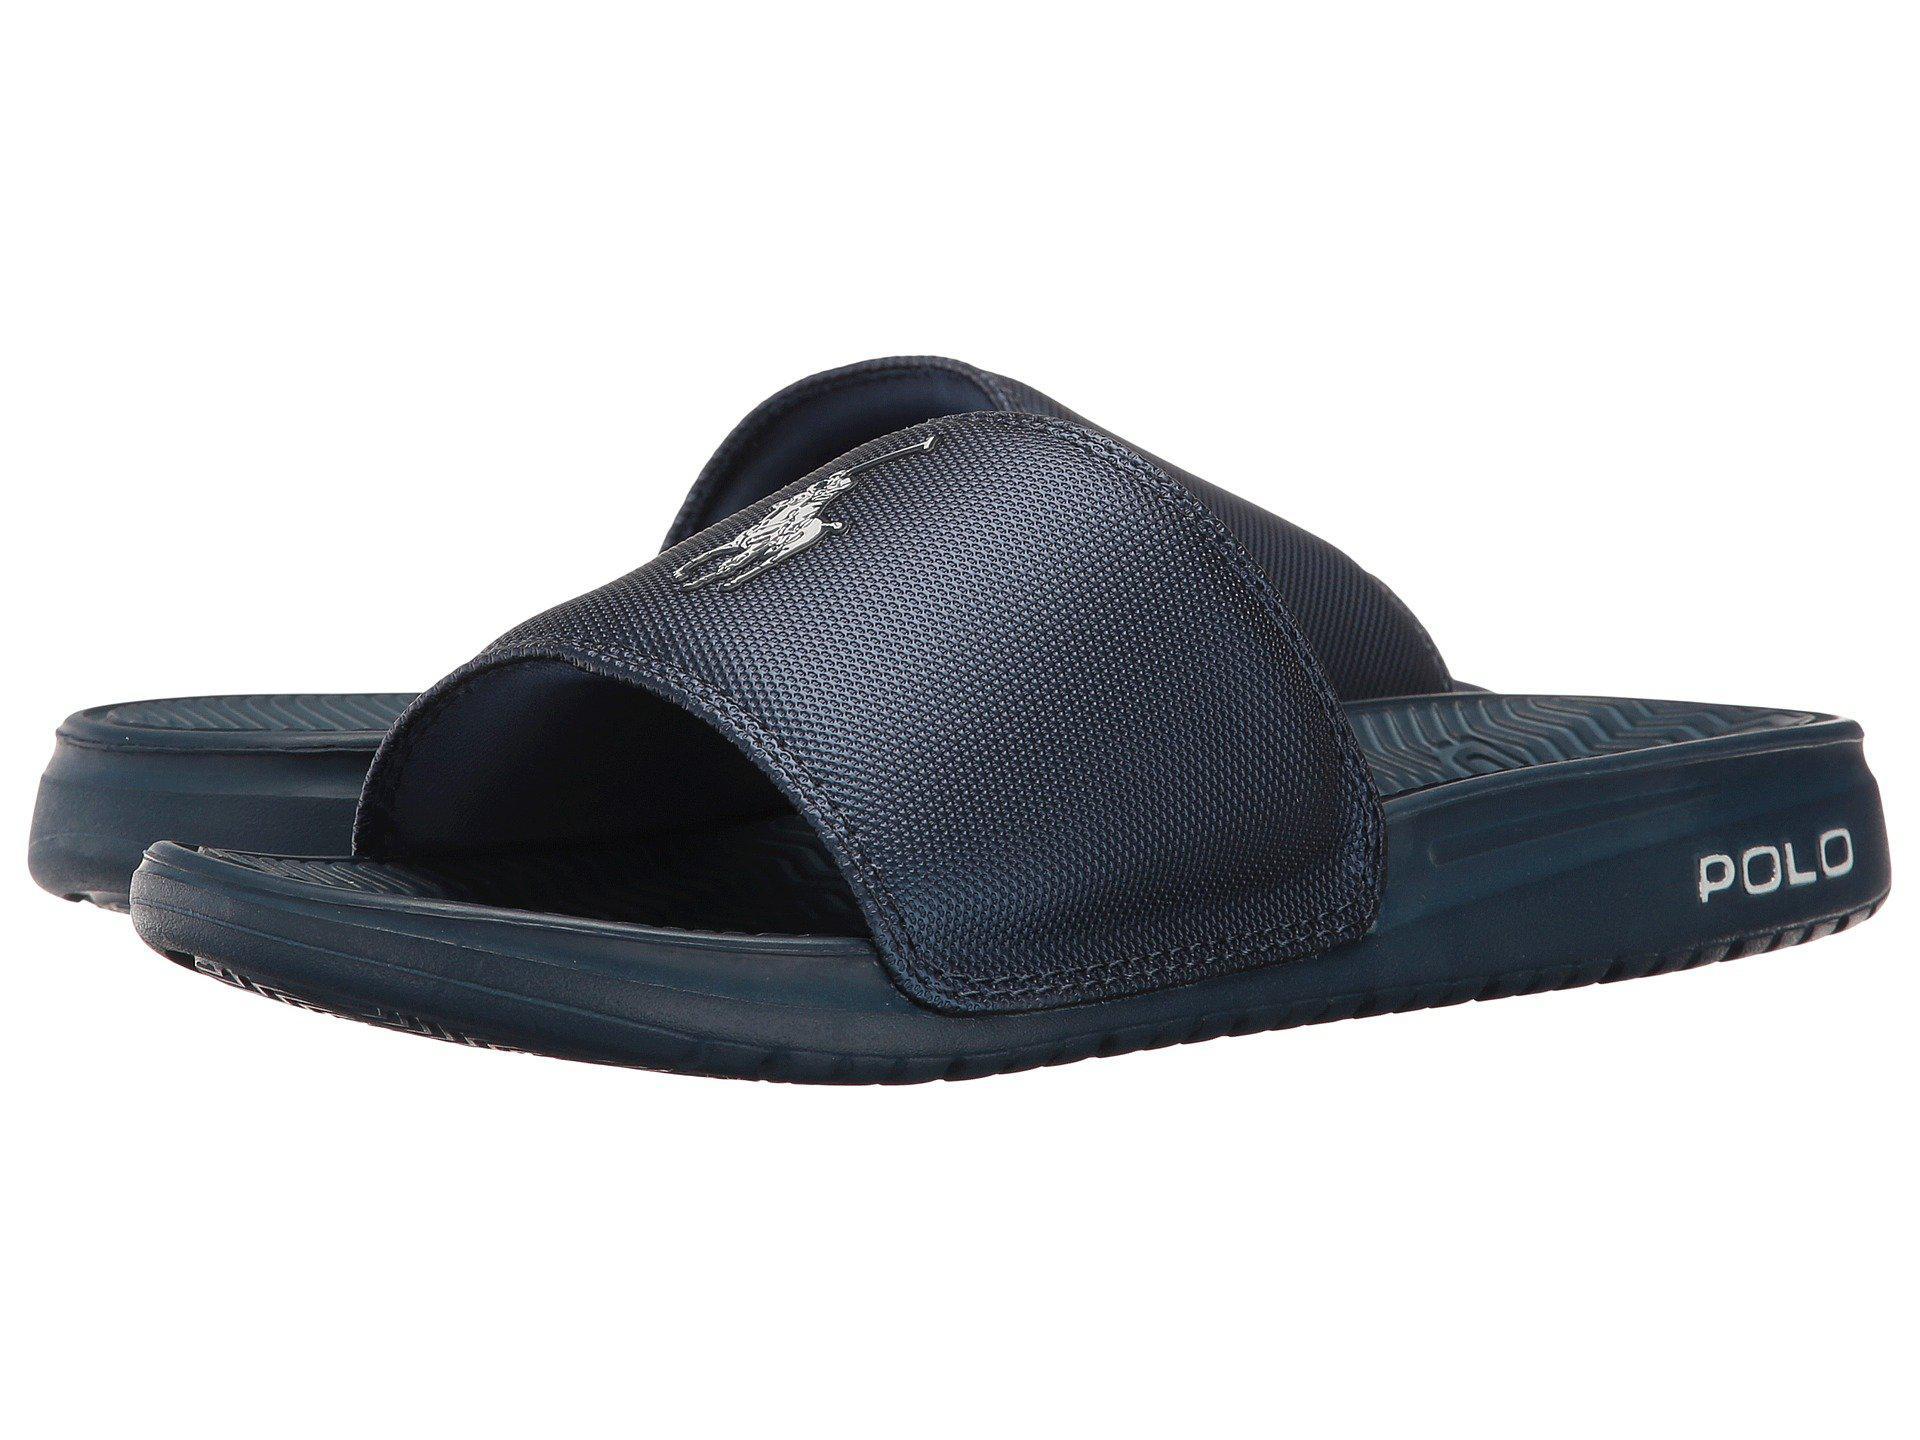 52e3179fb219 Lyst - Polo Ralph Lauren Rodwell (blue) Men s Shoes in Blue for Men